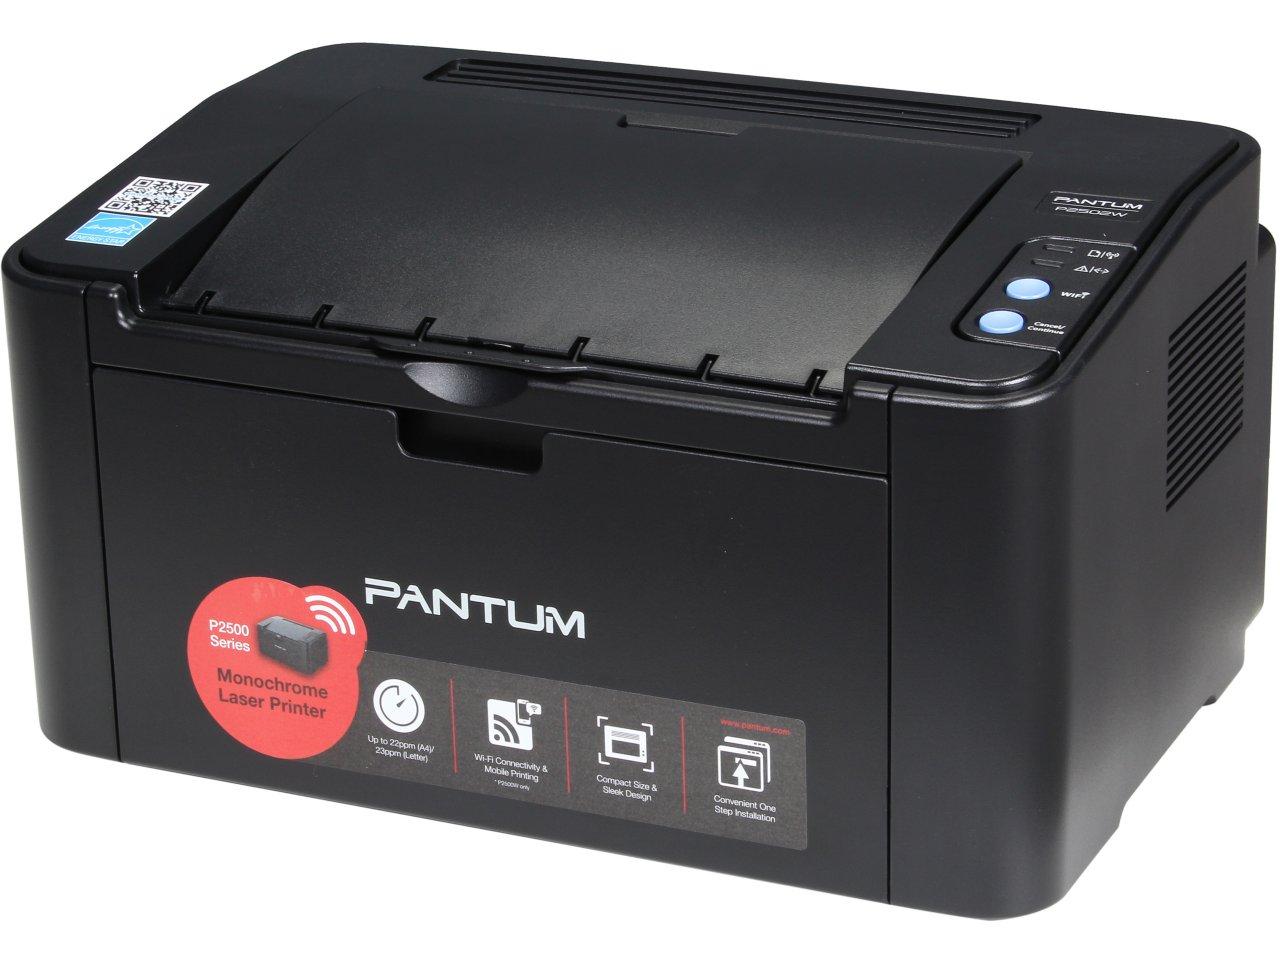 Pantum P2502W 1200 x 1200 dpi USB/Wireless Monochrome Laser Printer for $29.99 AC + Free Shipping @ Newegg.com